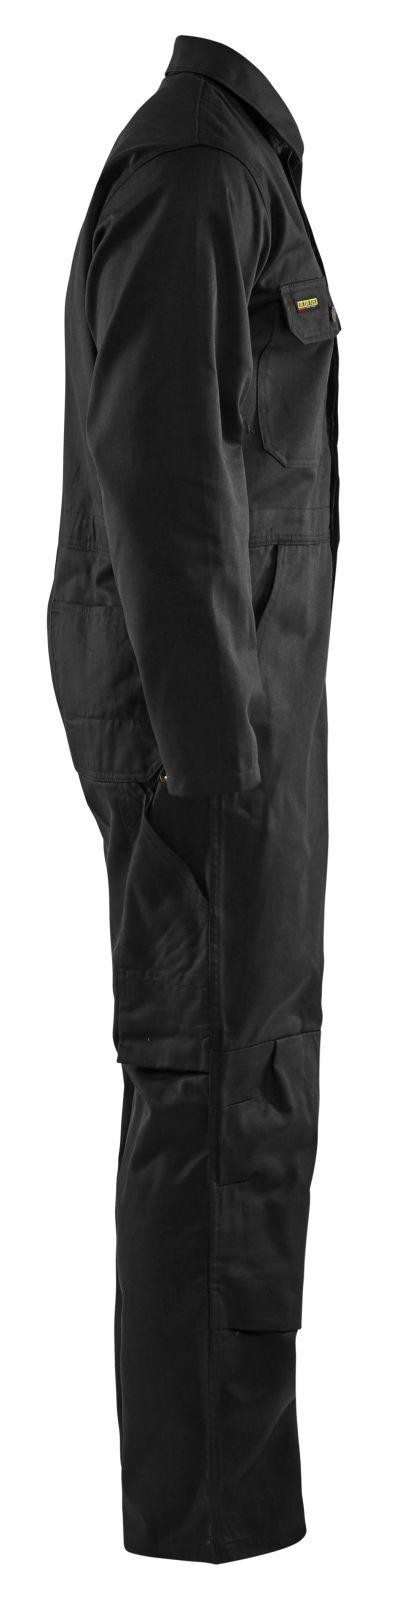 Blaklader Overalls 61511000 zwart(9900)